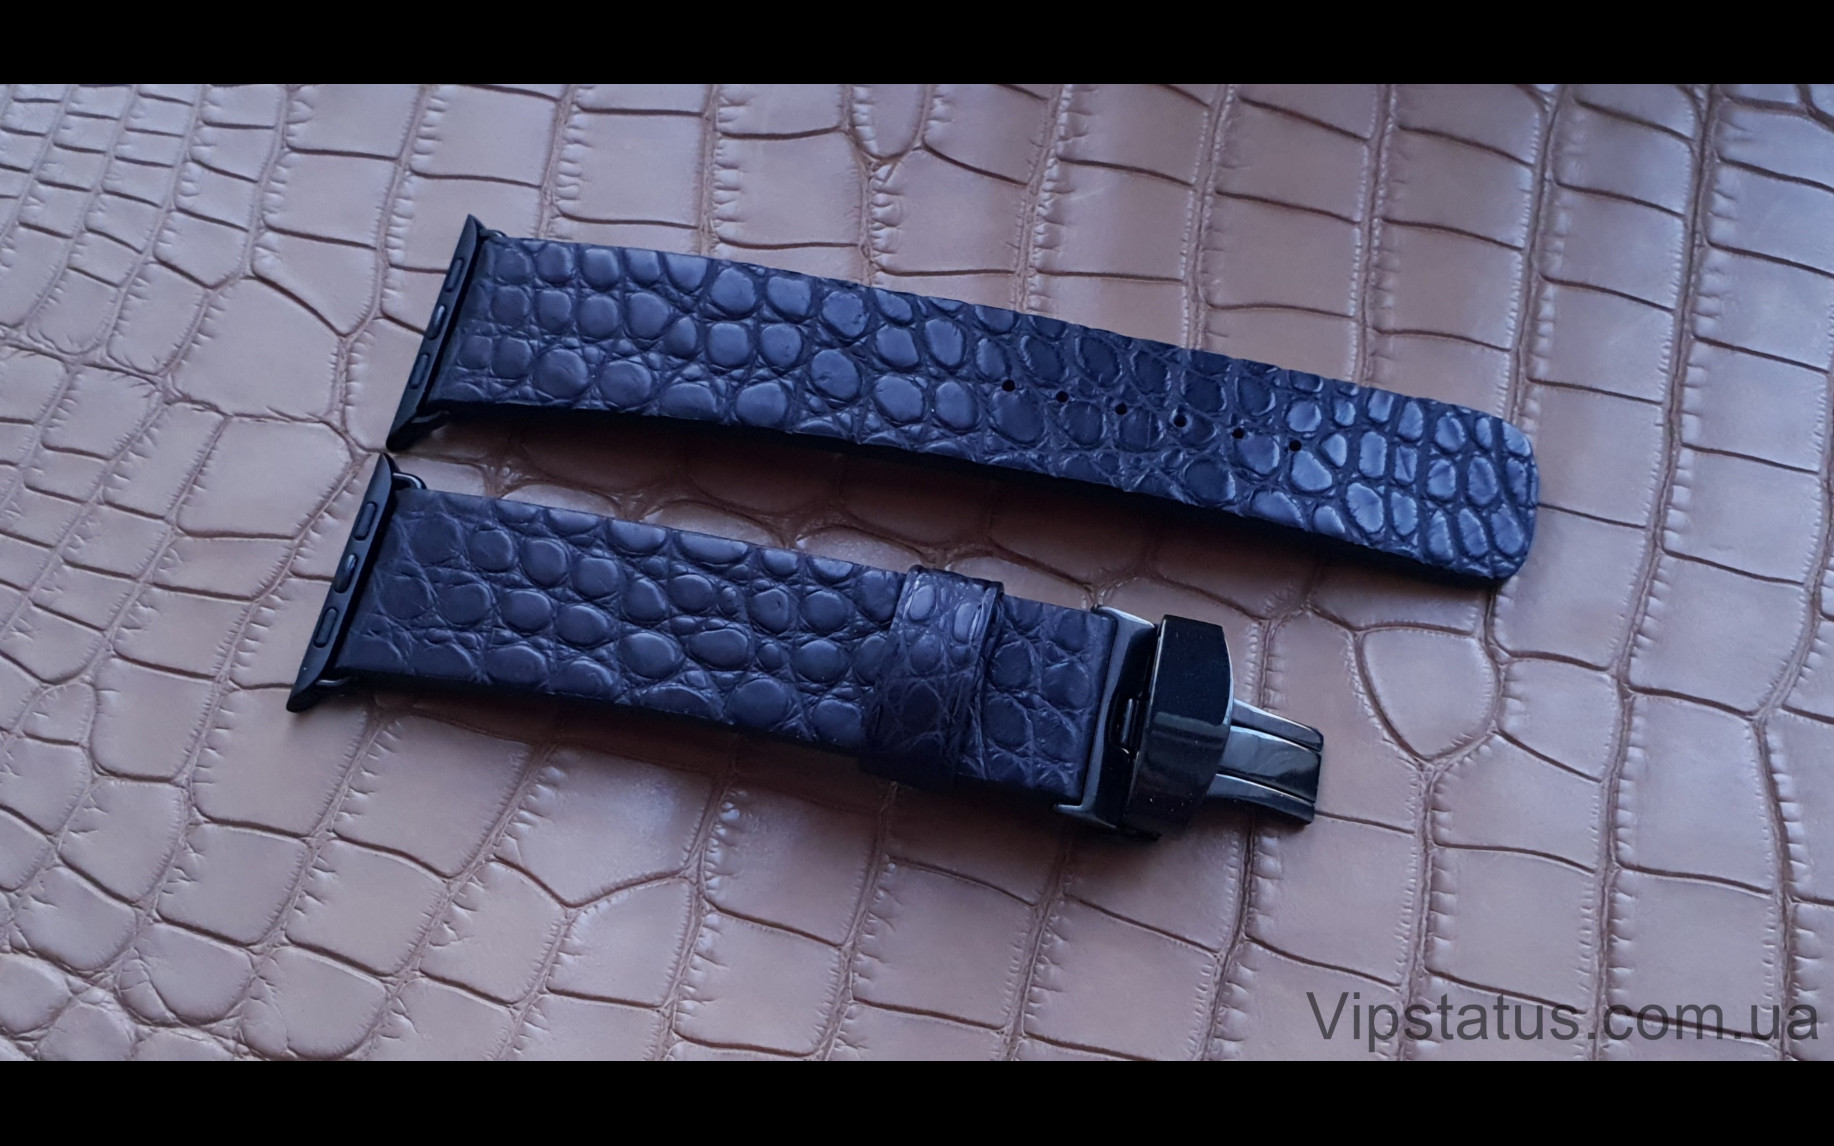 Elite Экзотический ремешок для часов Apple кожа крокодила Exotic Crocodile Strap for Apple watches image 2